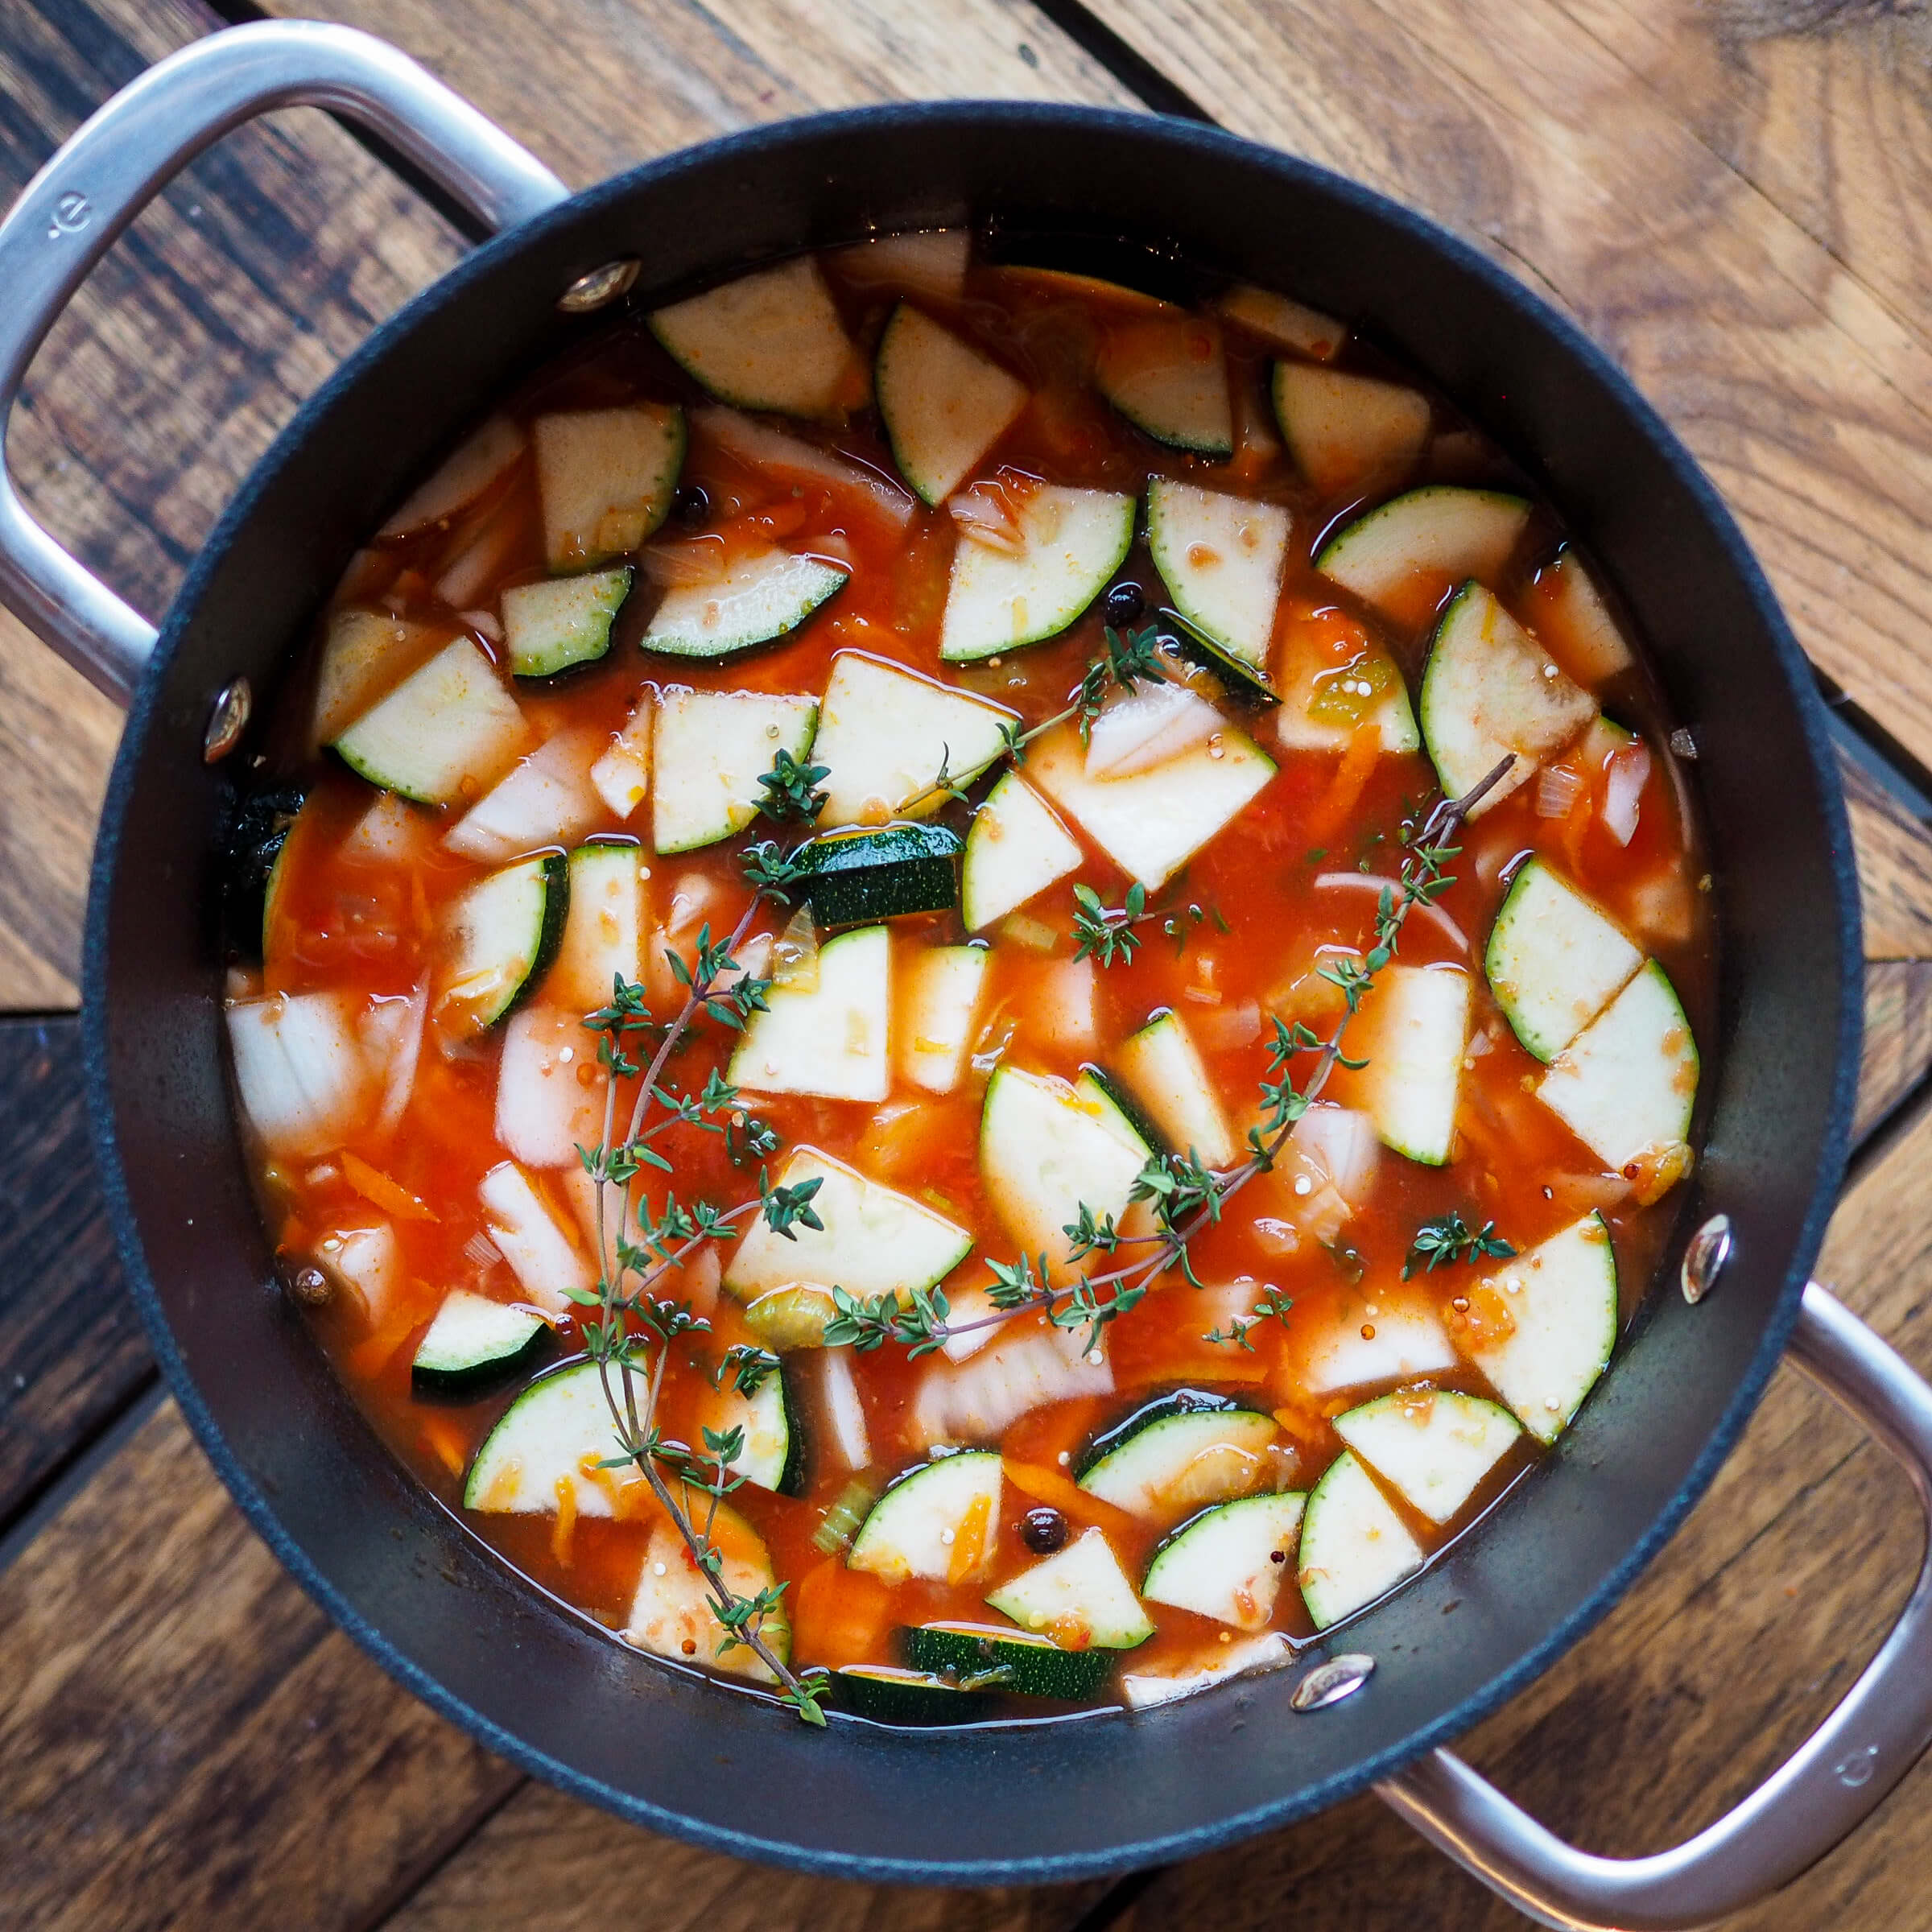 Zeleninová polévka squinoou